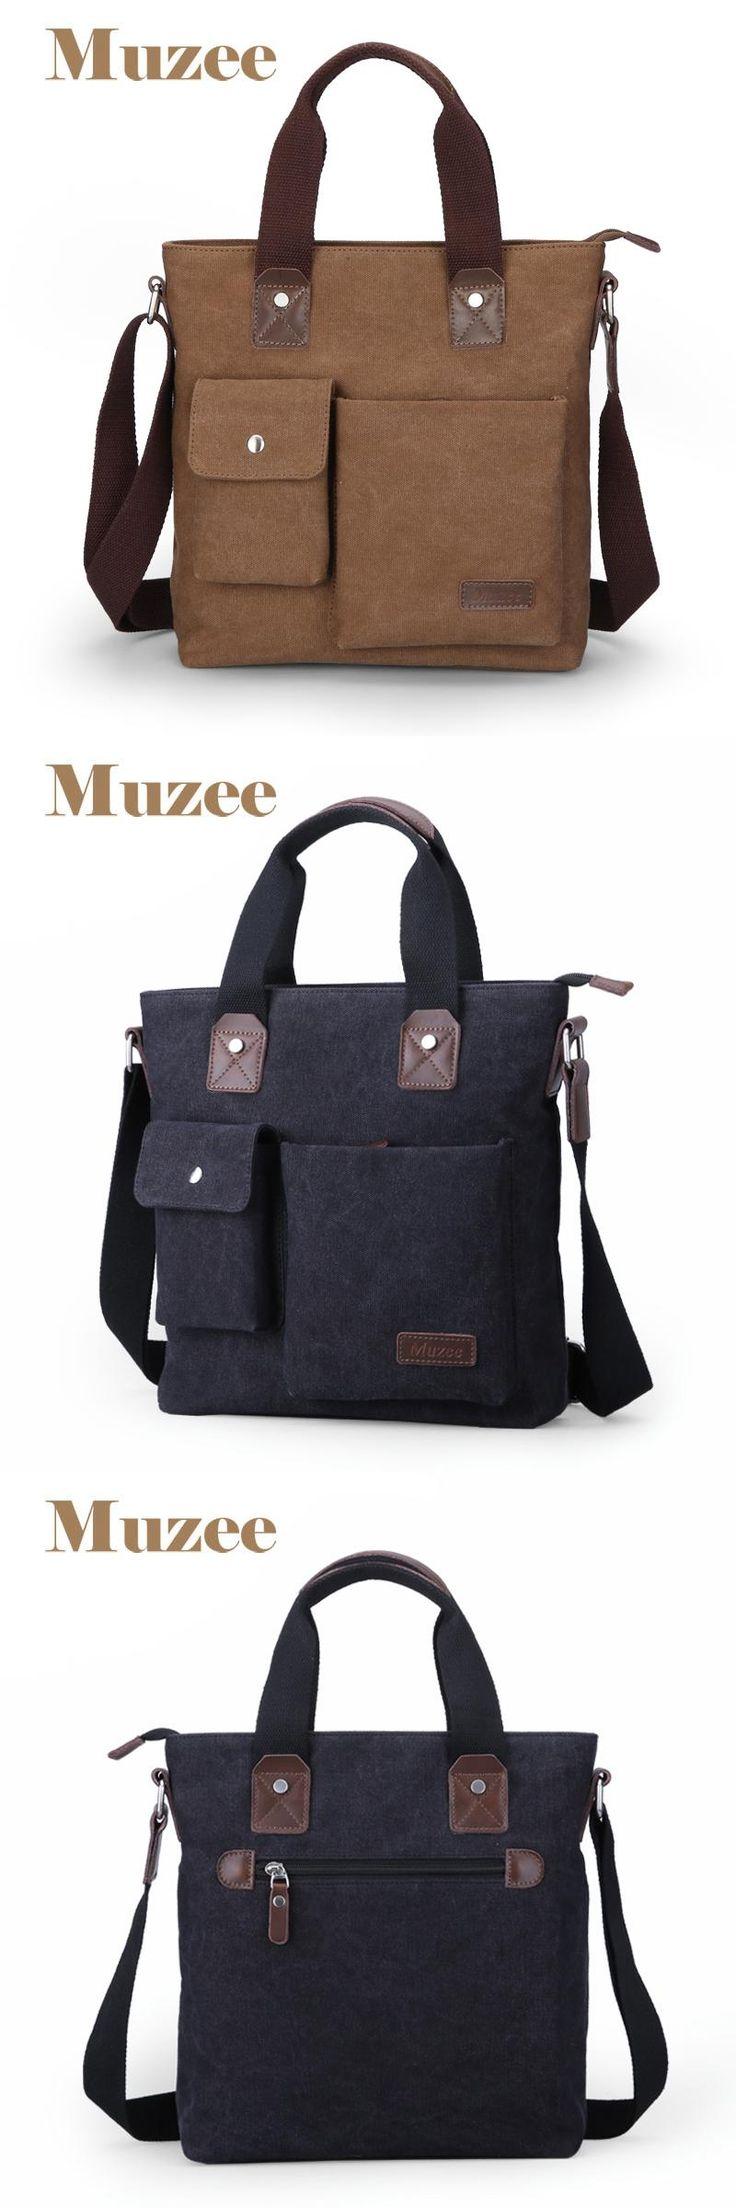 [Visit to Buy] Muzee fashion Business casual men's bags handbag Canvas Totes Multi-function bag ME_0466 #Advertisement